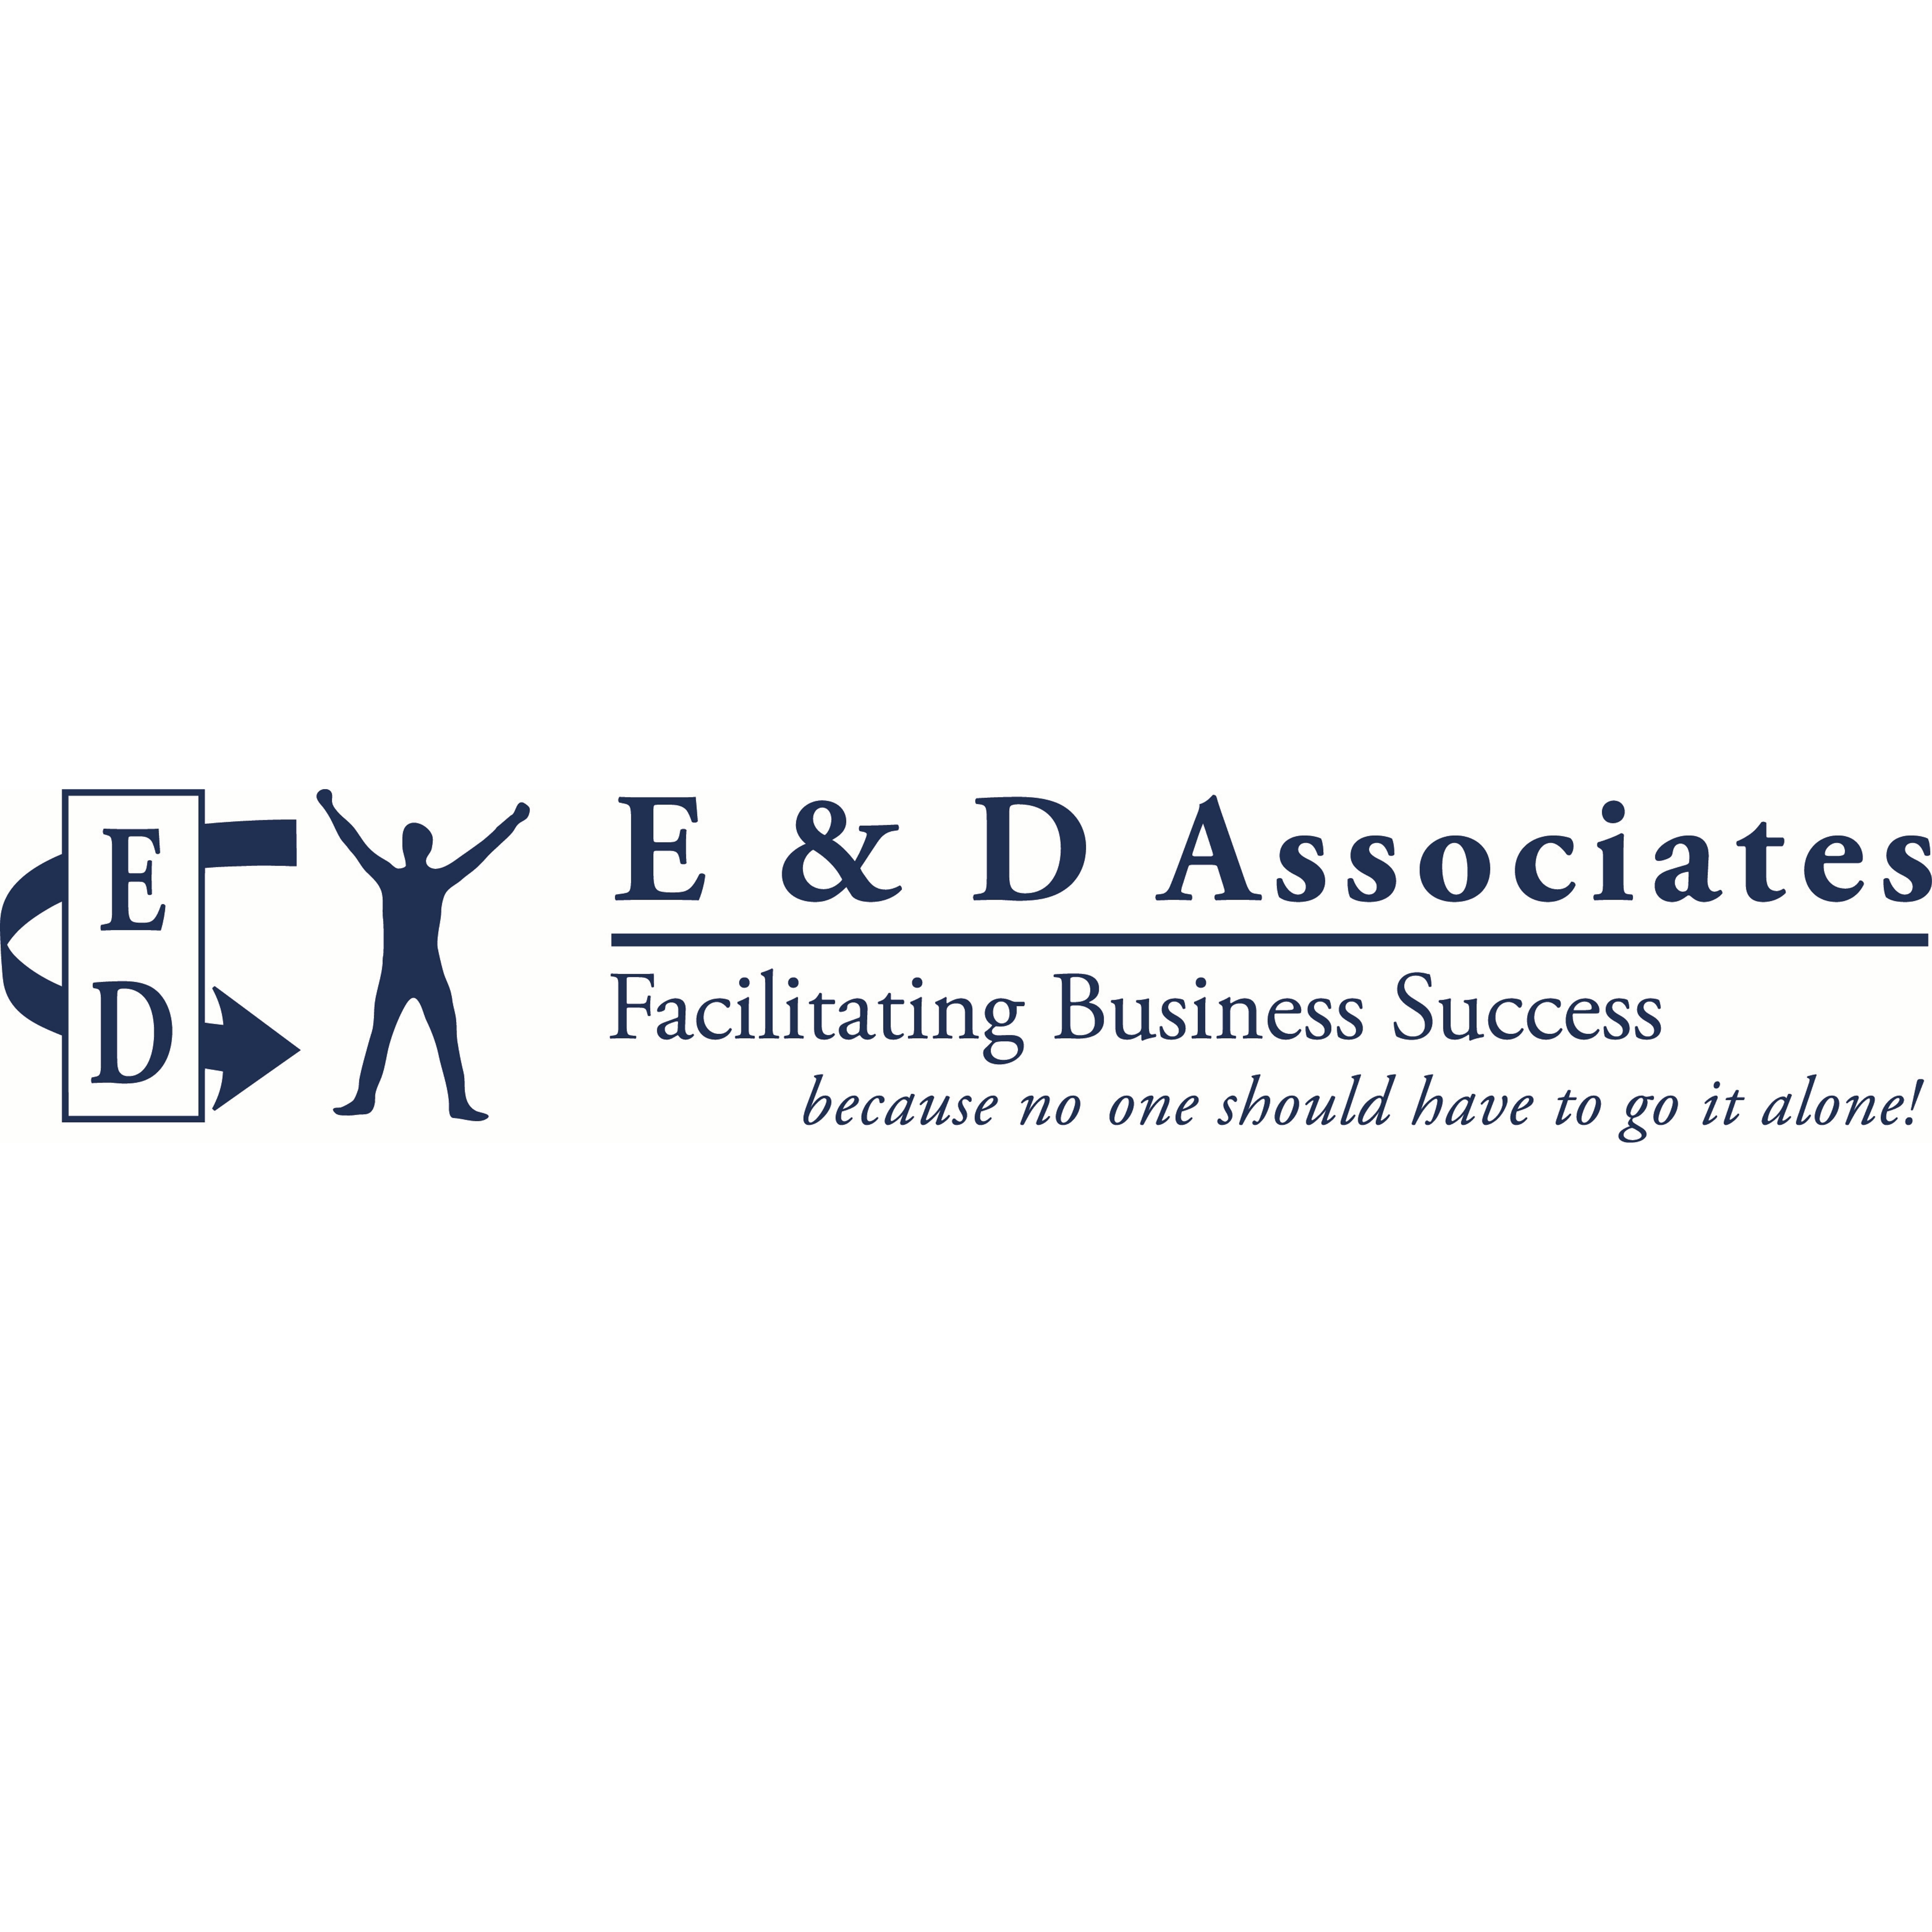 image of the E & D Associates